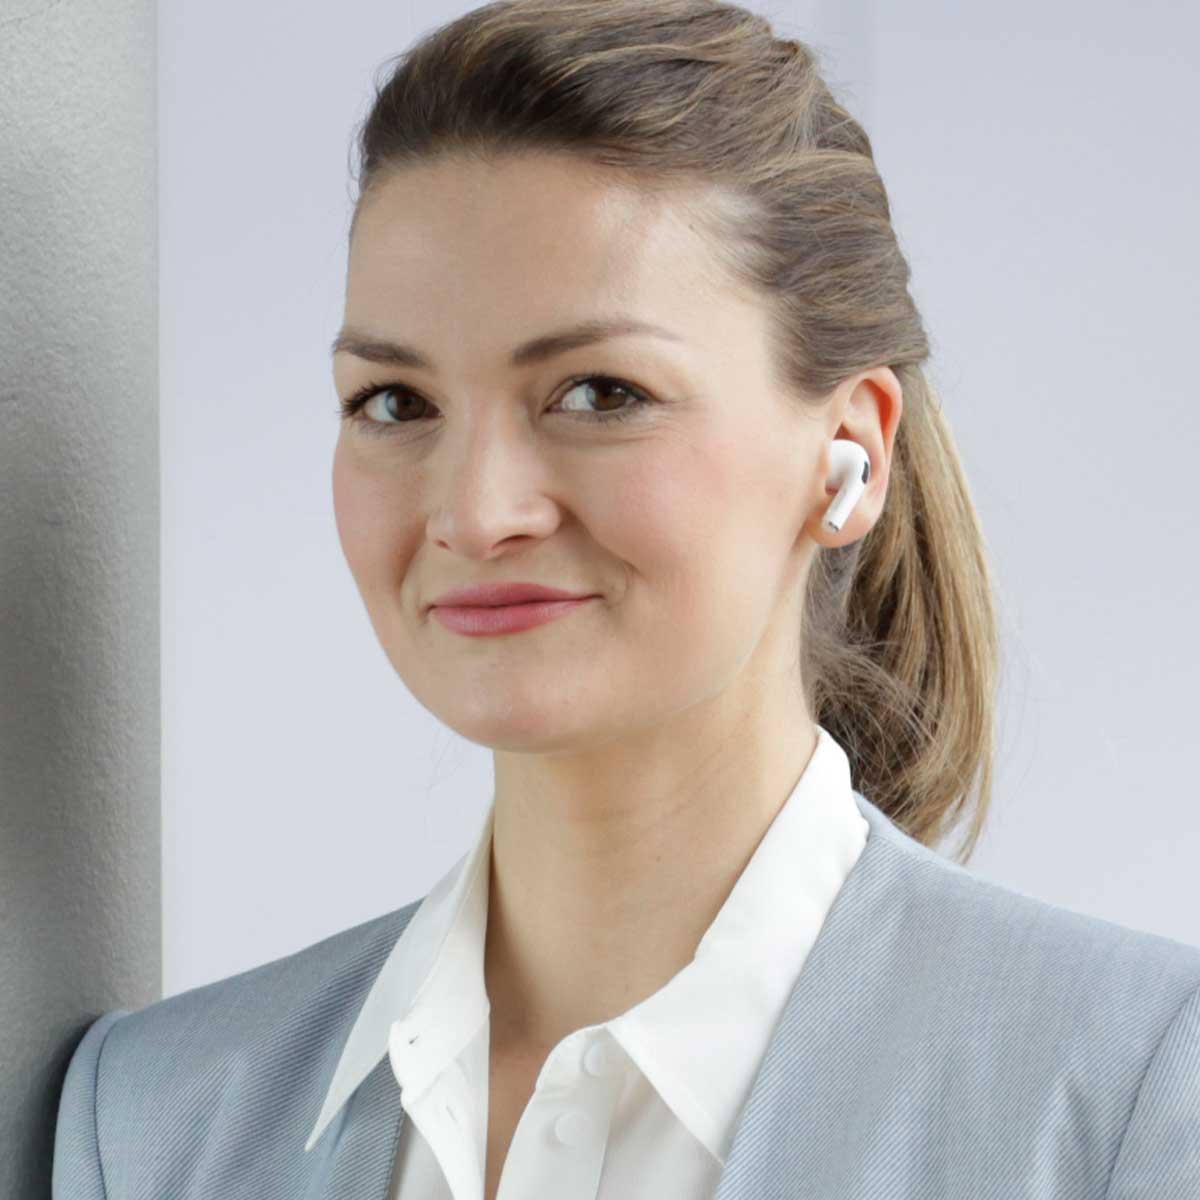 Judith Gerlach, Staatsminsterin für Digitales. Foto: Susie Knoll